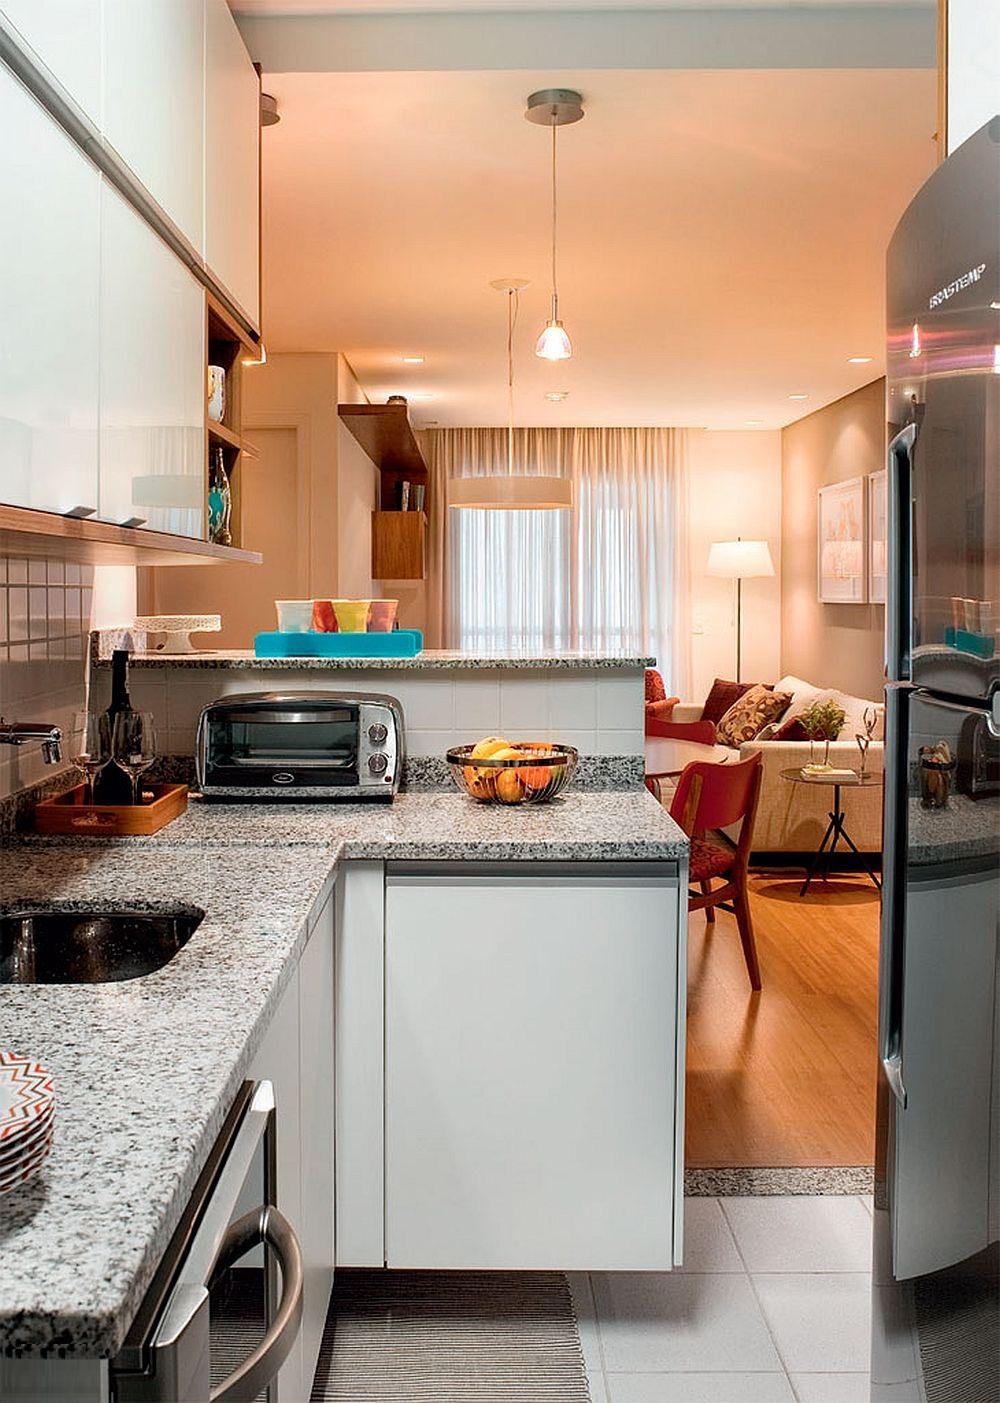 adelaparvu.com despre apartament de trei camere cu gratar pe balcon, designer Daniela Berardinelli (7)